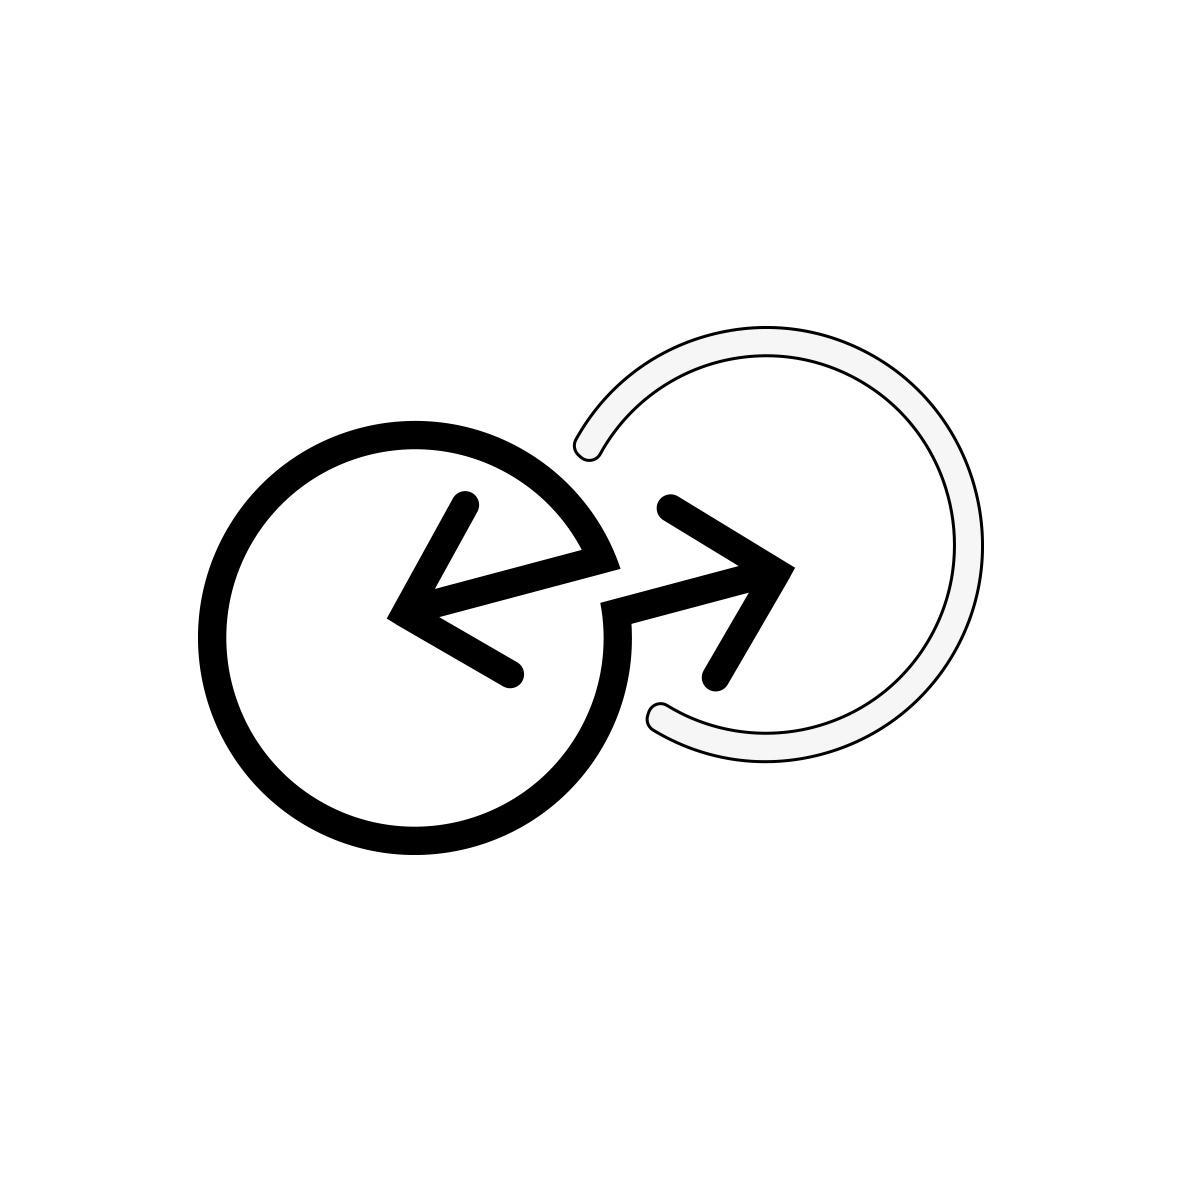 GG/箭头